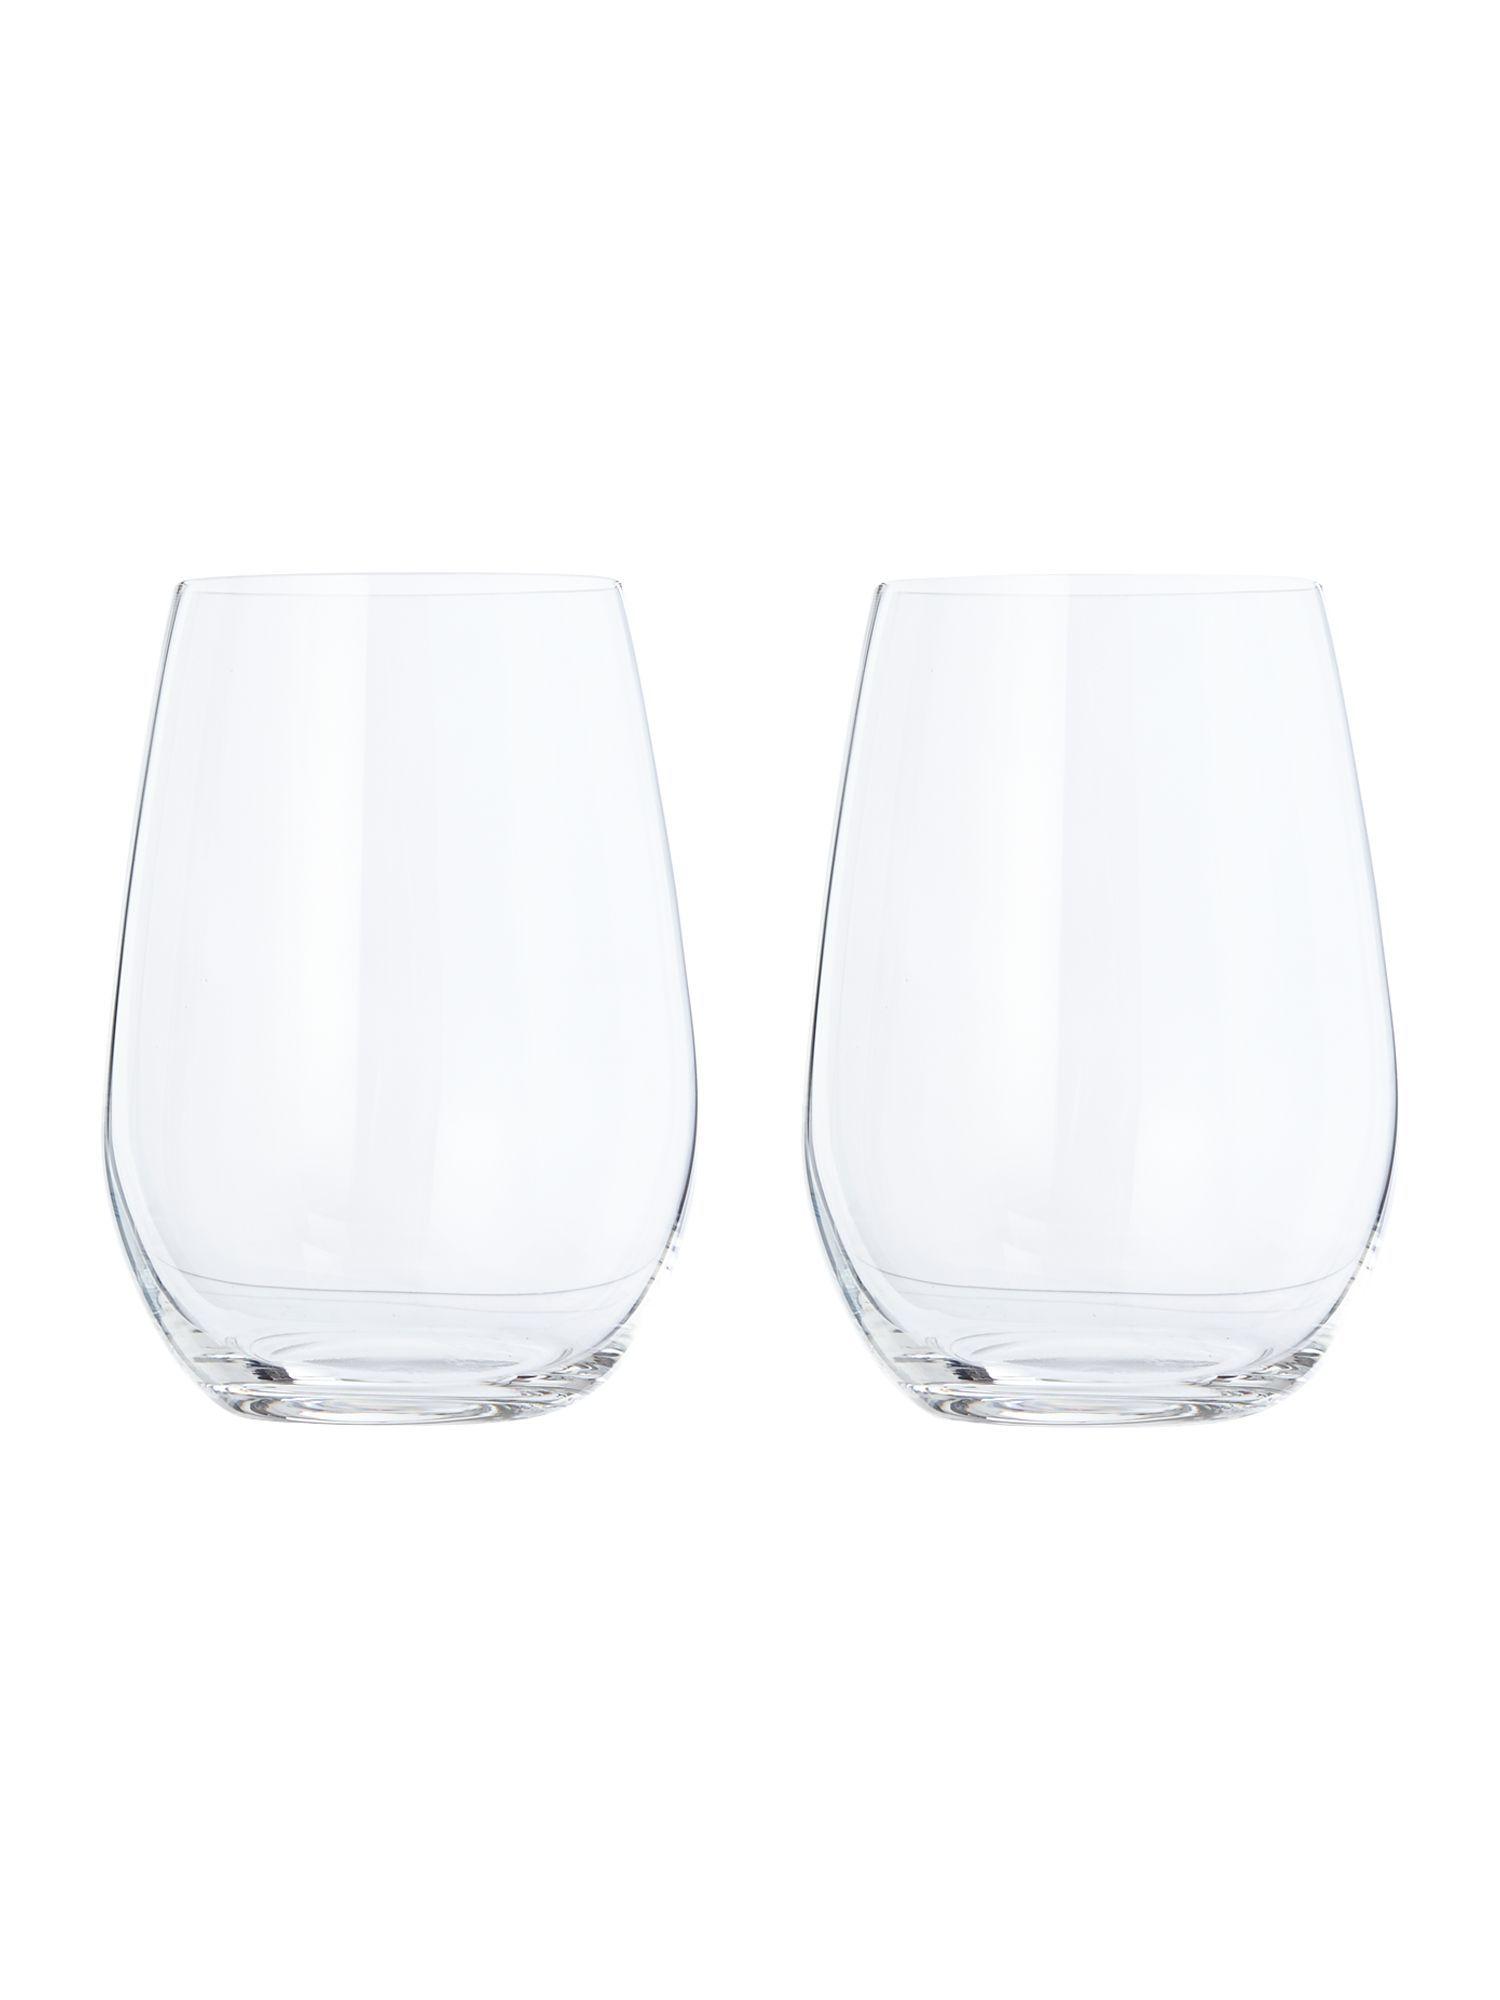 1b3182cd8e4 Riedel O Stemless Sauvignon/riesling Wine Glass Set Of 2 - House of ...